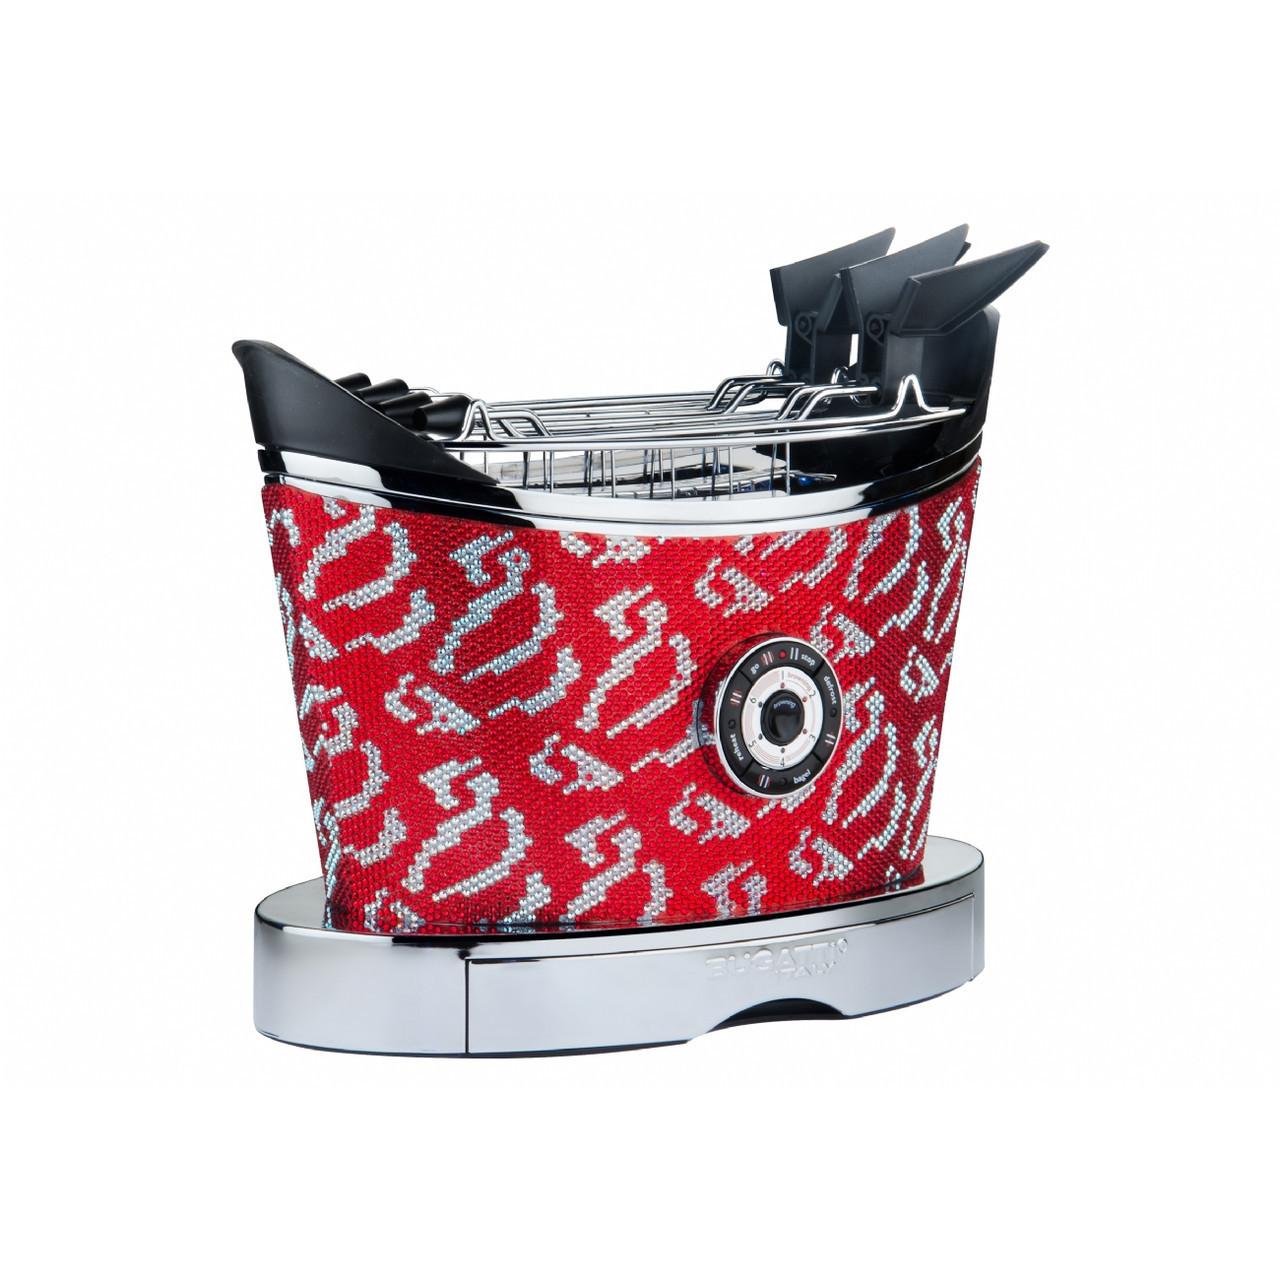 Тостер Casa Bugatti 13-VOLOSW1A/CR cristalli rossi , цвет красный